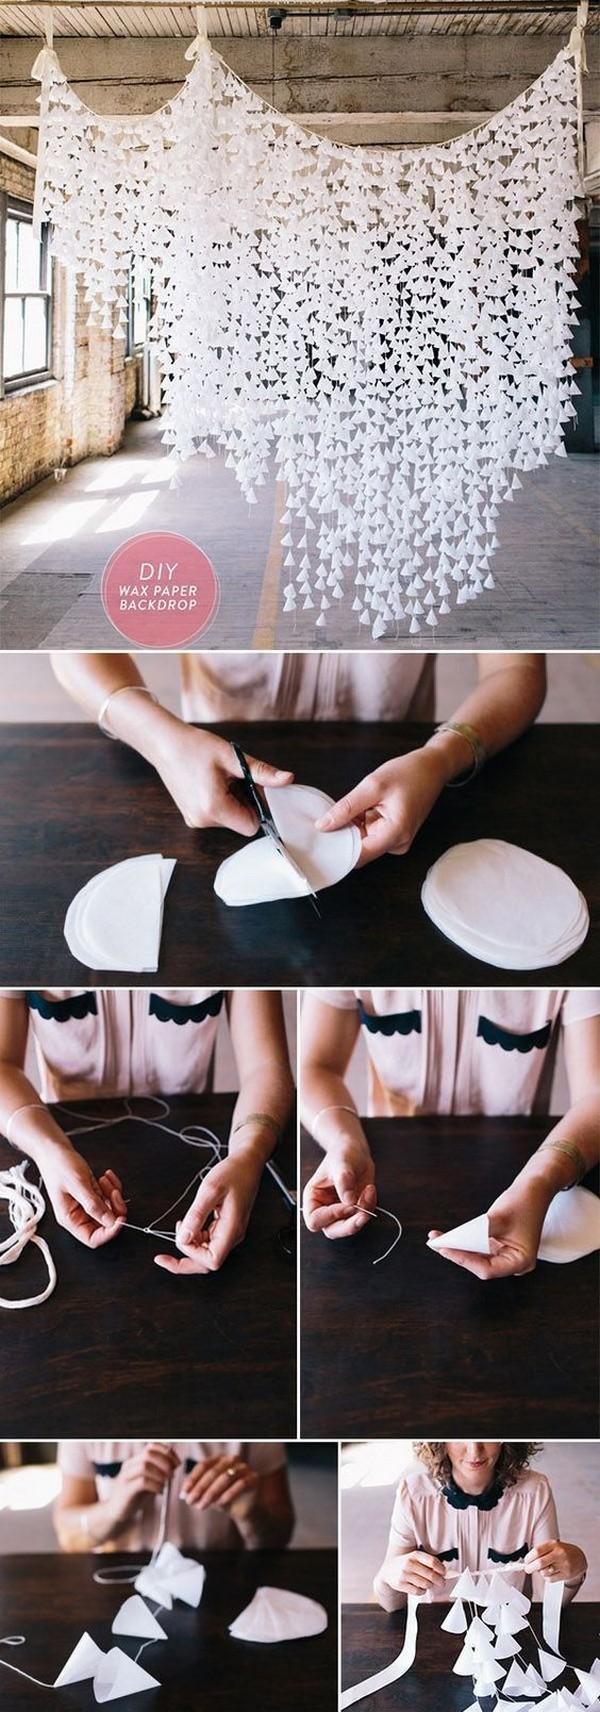 diy wax paper wedding backdrop decoration ideas